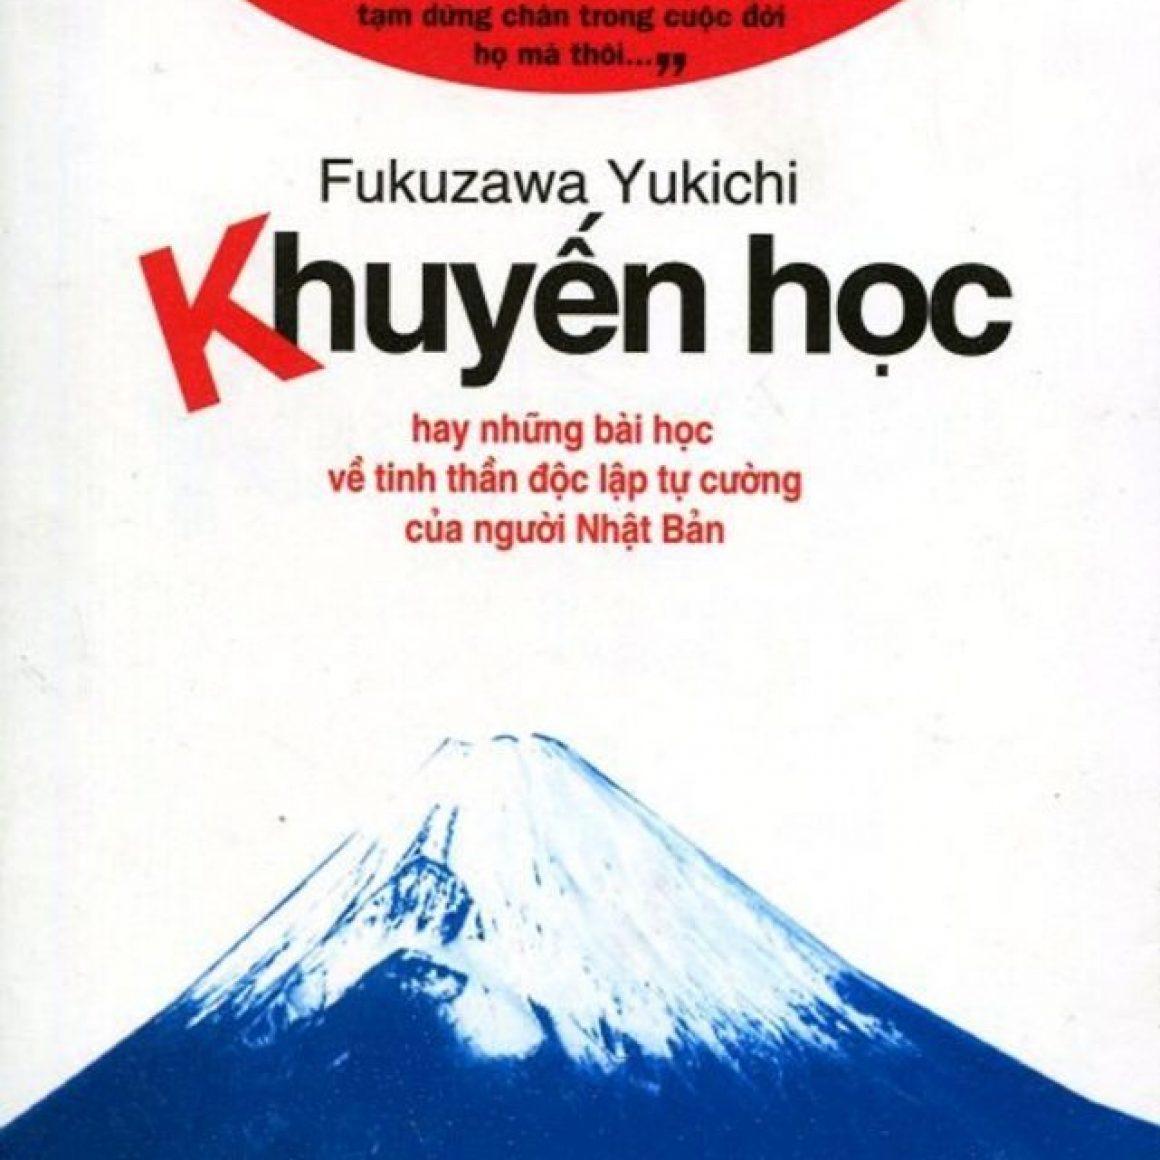 khuyen-hoc